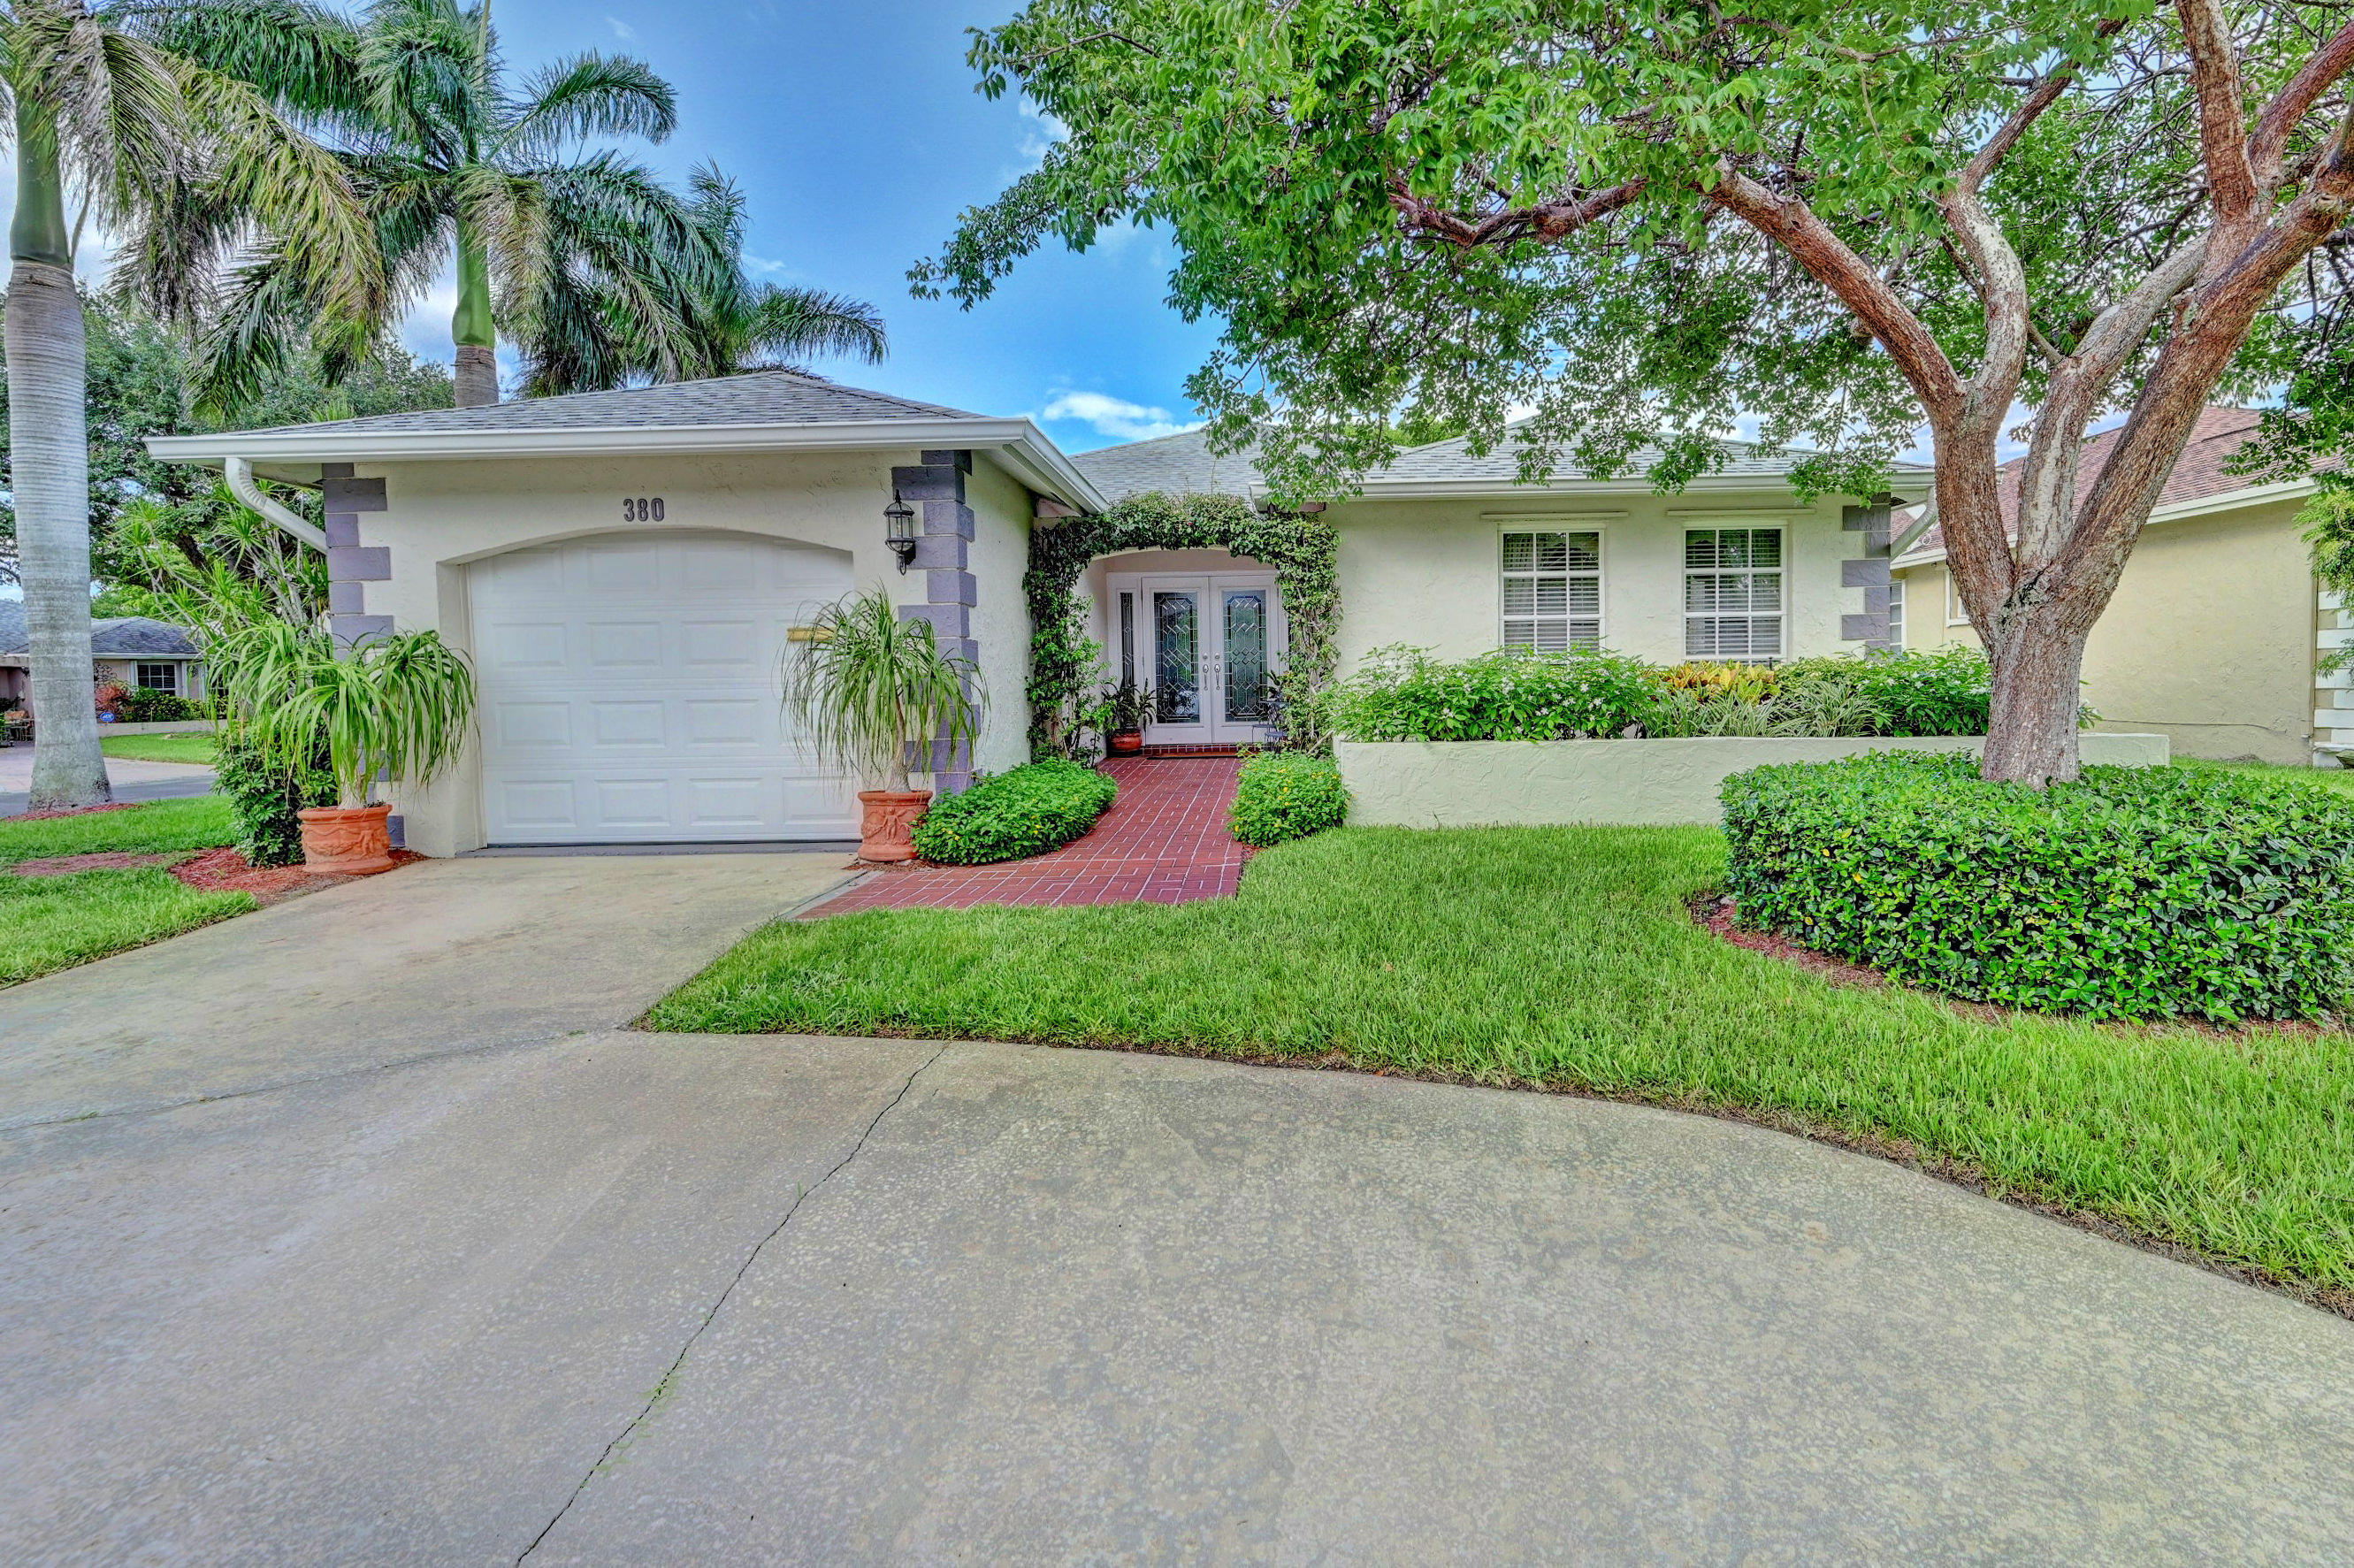 Home for sale in Lincolnwood Village Boca Raton Florida